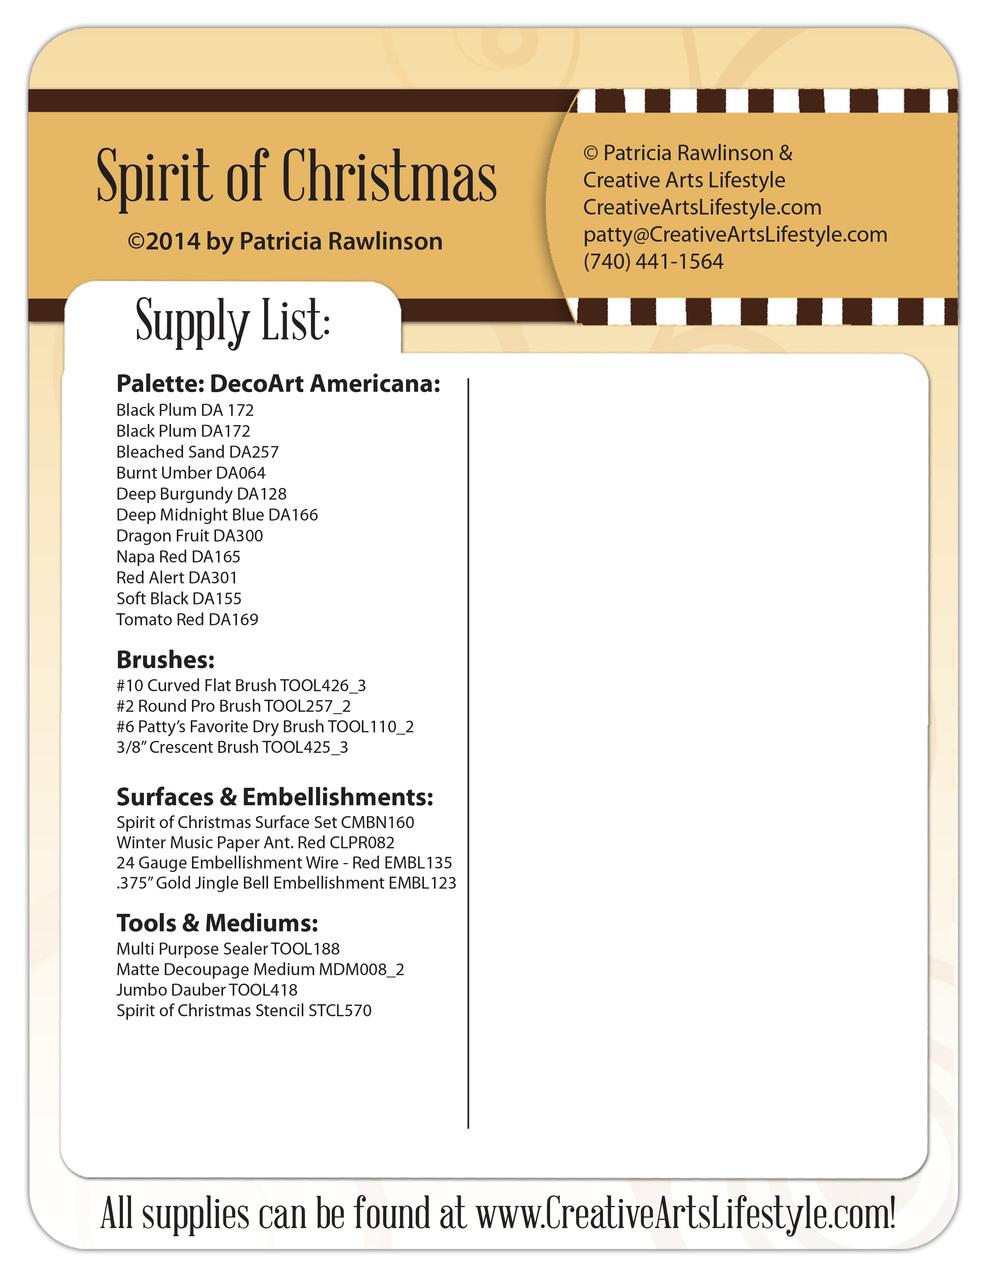 Spirit of Christmas E-Packet - Patricia Rawlinson